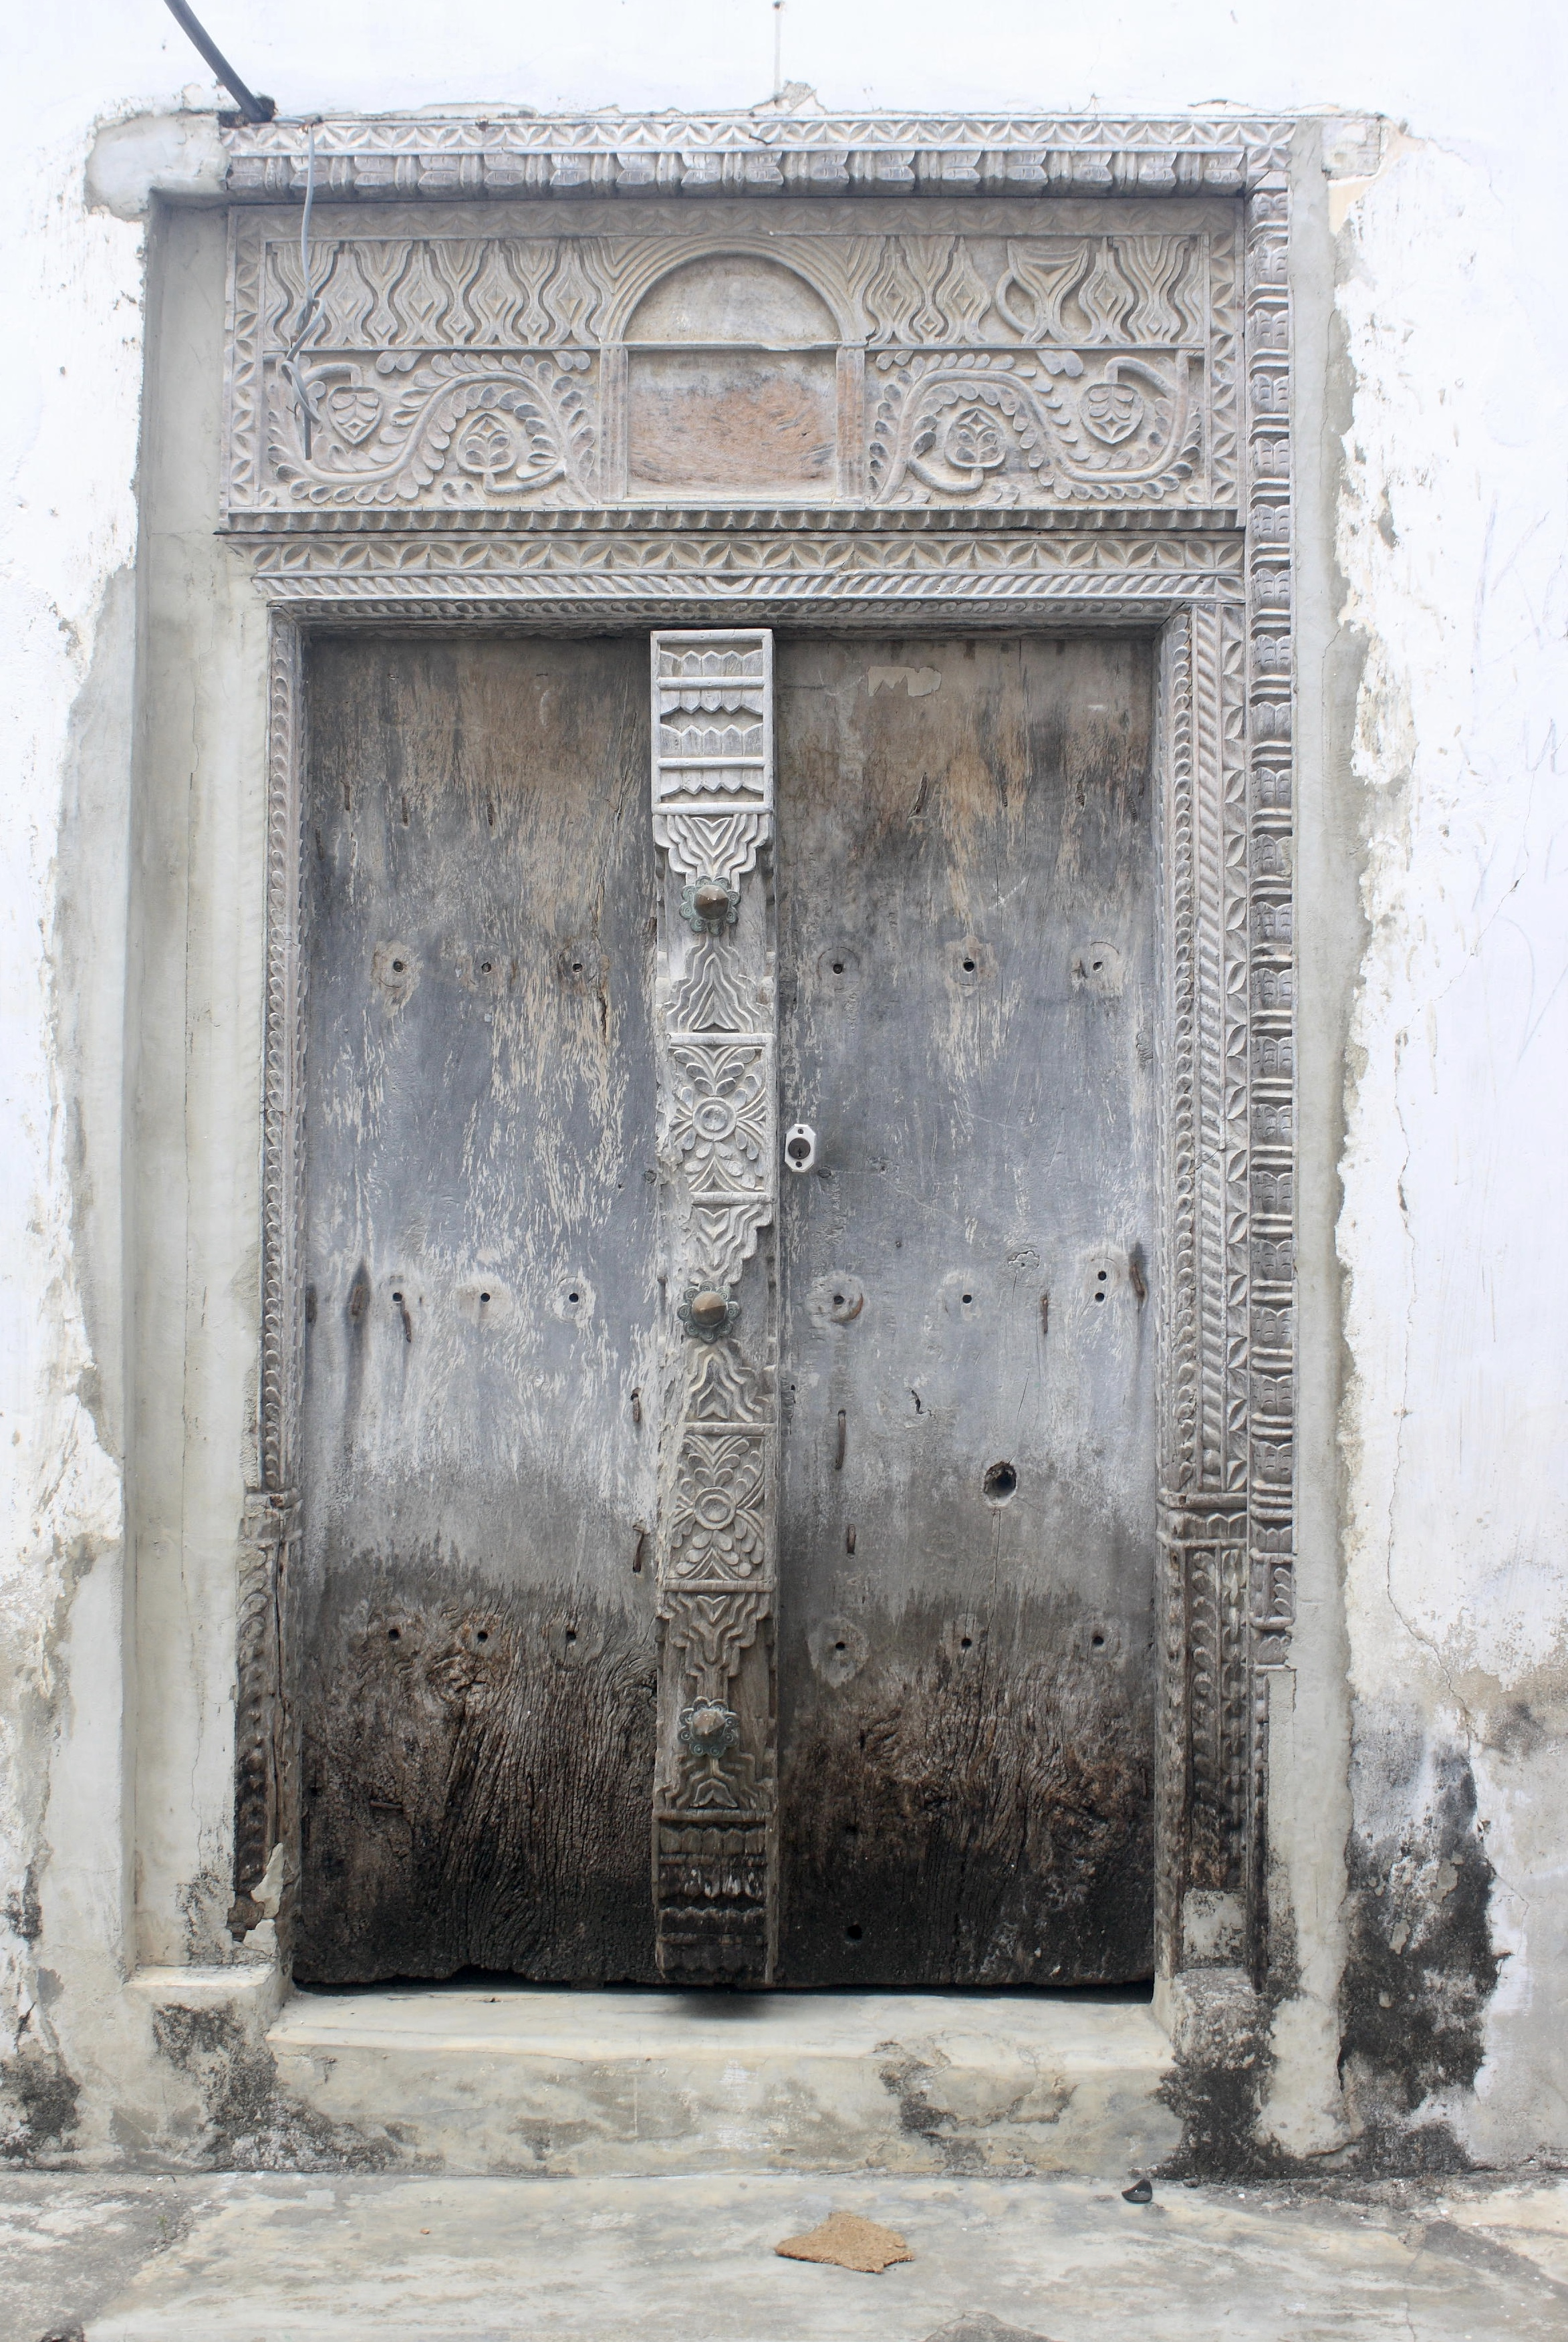 An old Zanzibar door with beautiful carvings